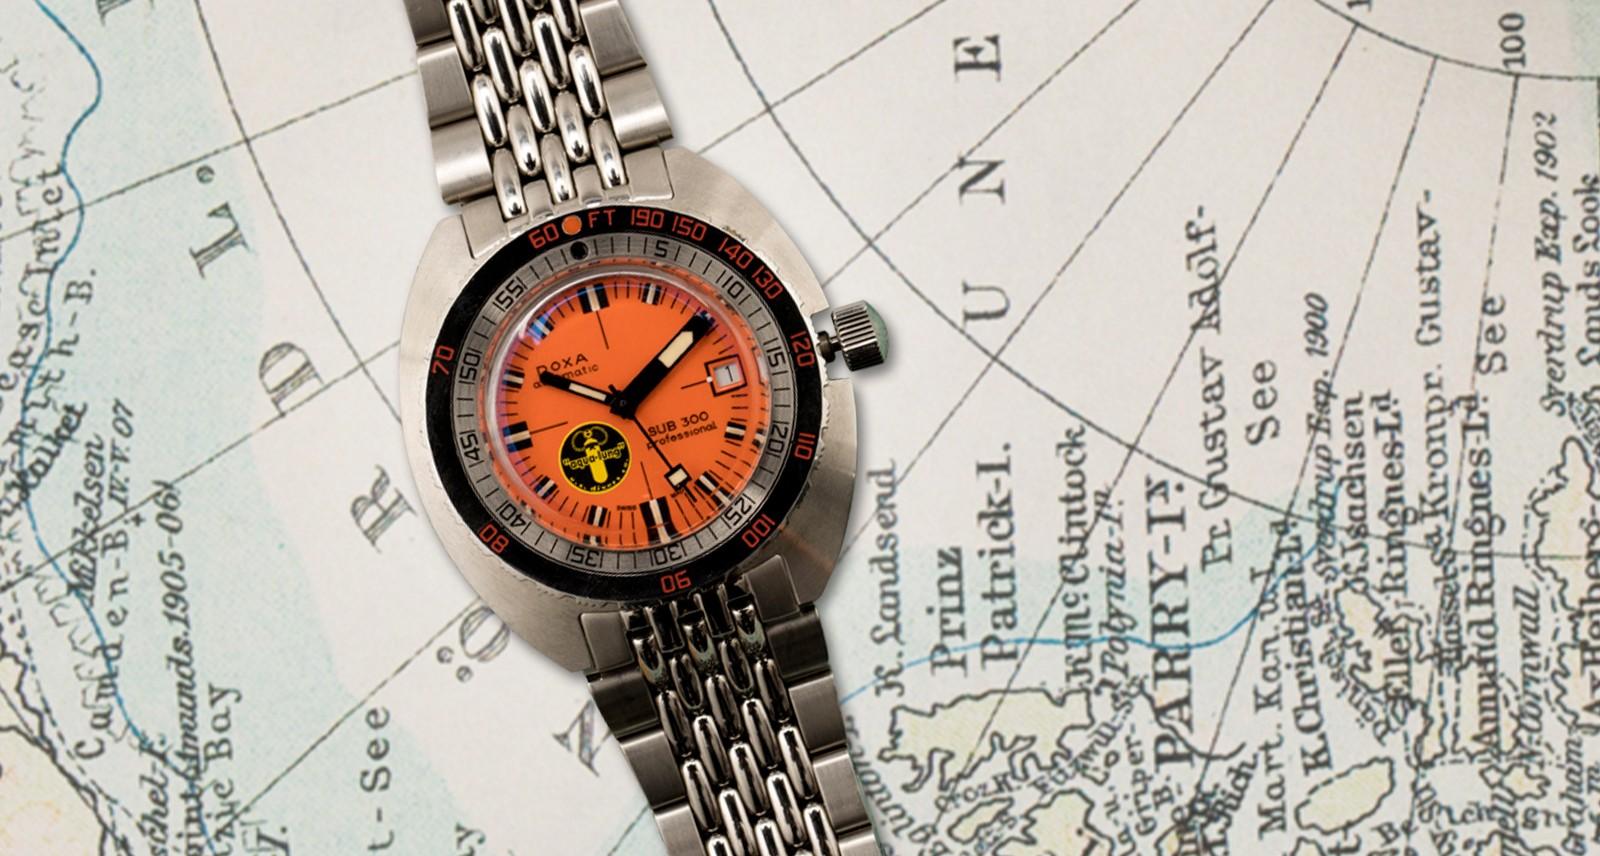 Jacques Cousteau's Favourite Dive Watch Is Back